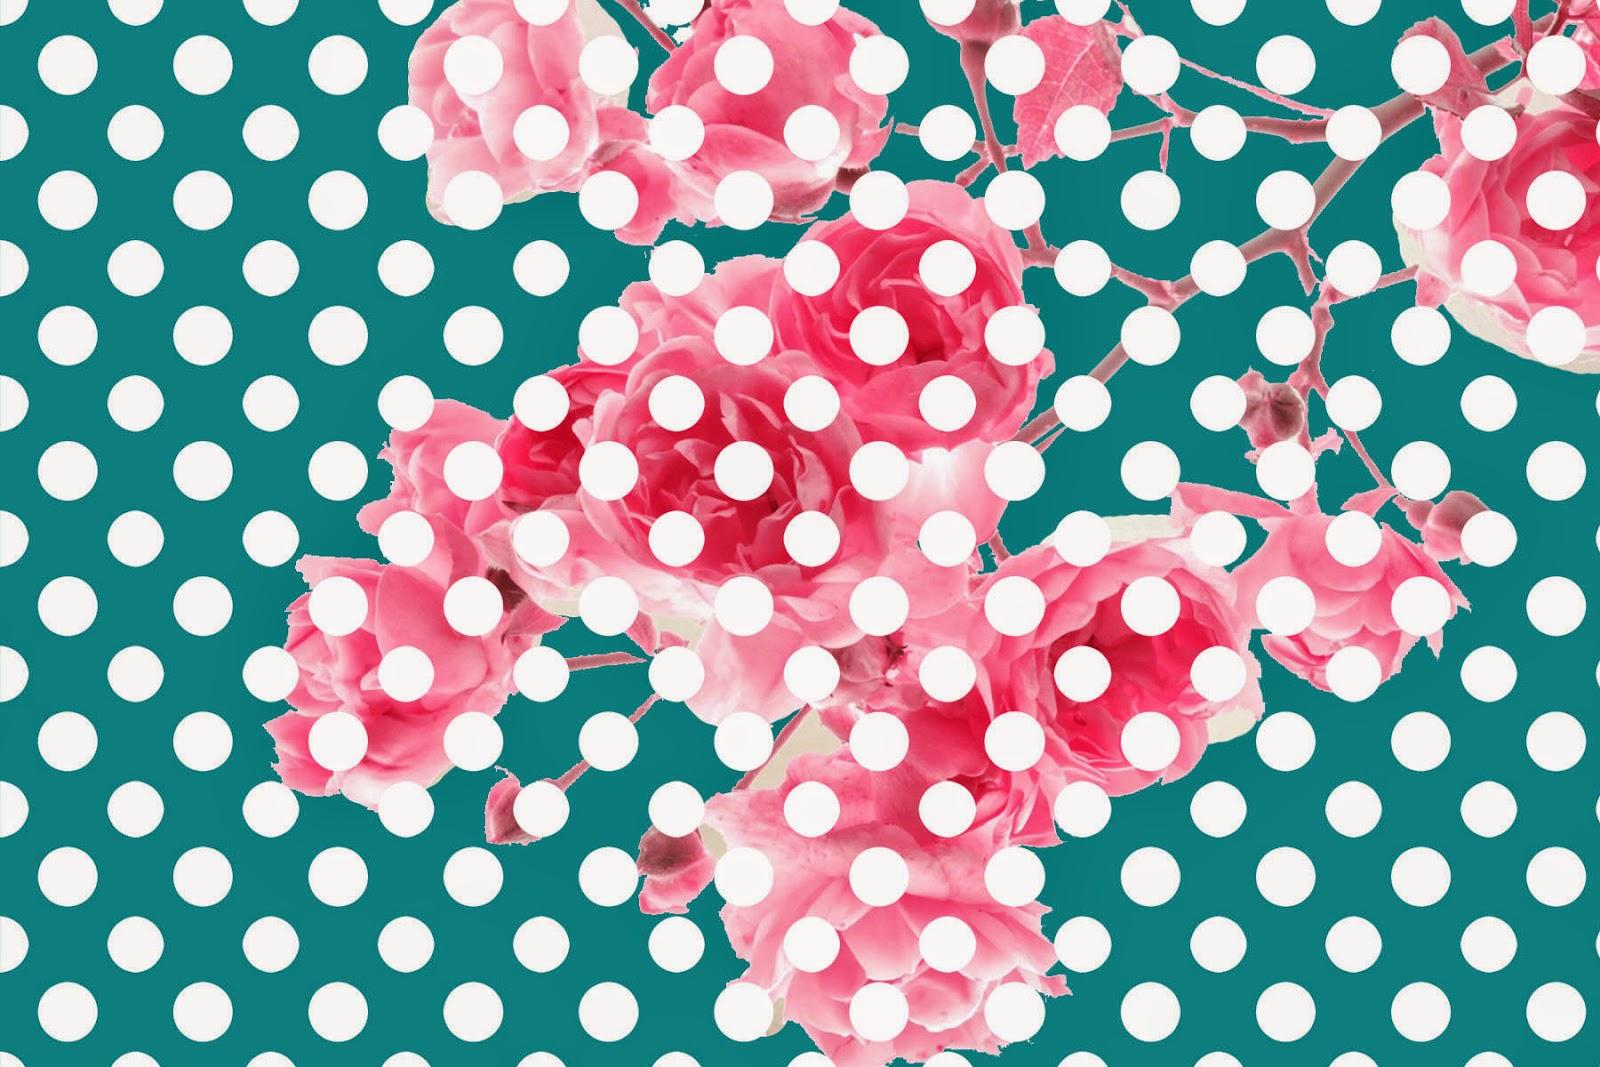 Doodlecraft wild rose blossoms polka dot wallpaper for Polka dot wallpaper